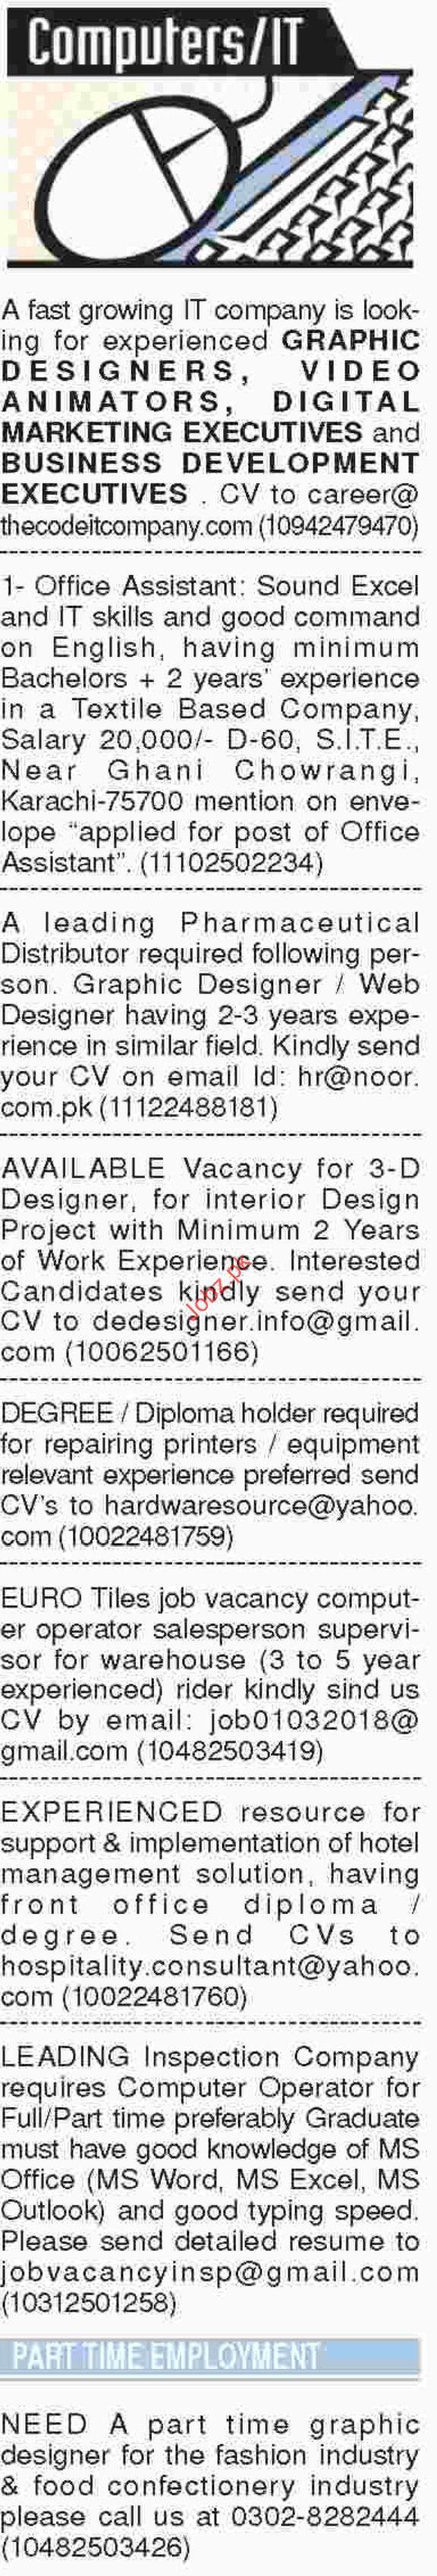 Graphic Designer Jobs in IT Company 2019 Job Advertisement Pakistan